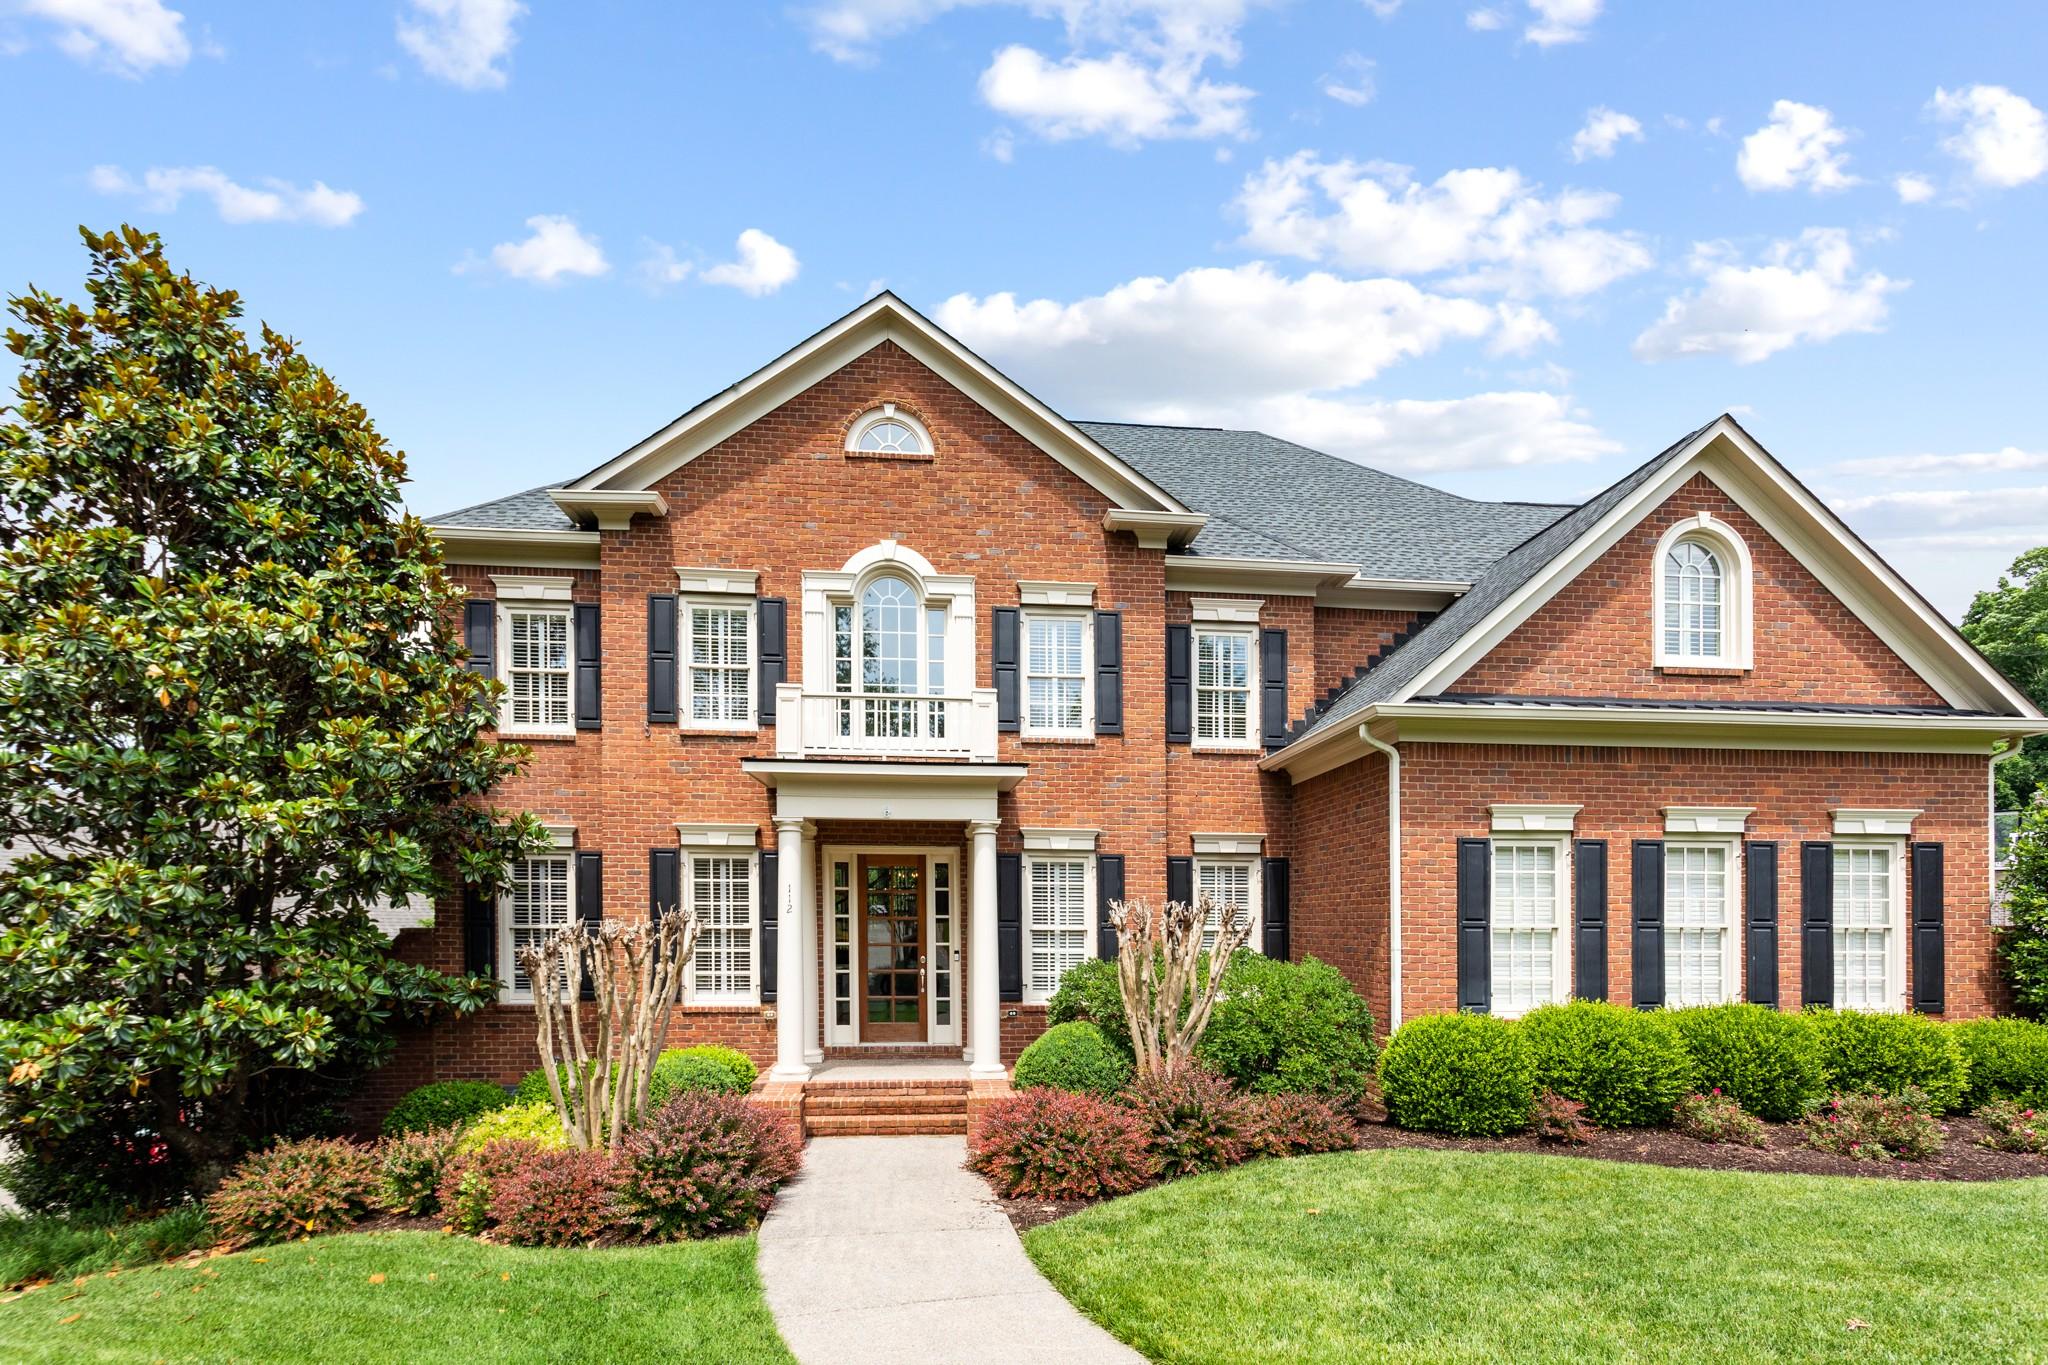 112 Chatfield Way Property Photo - Franklin, TN real estate listing